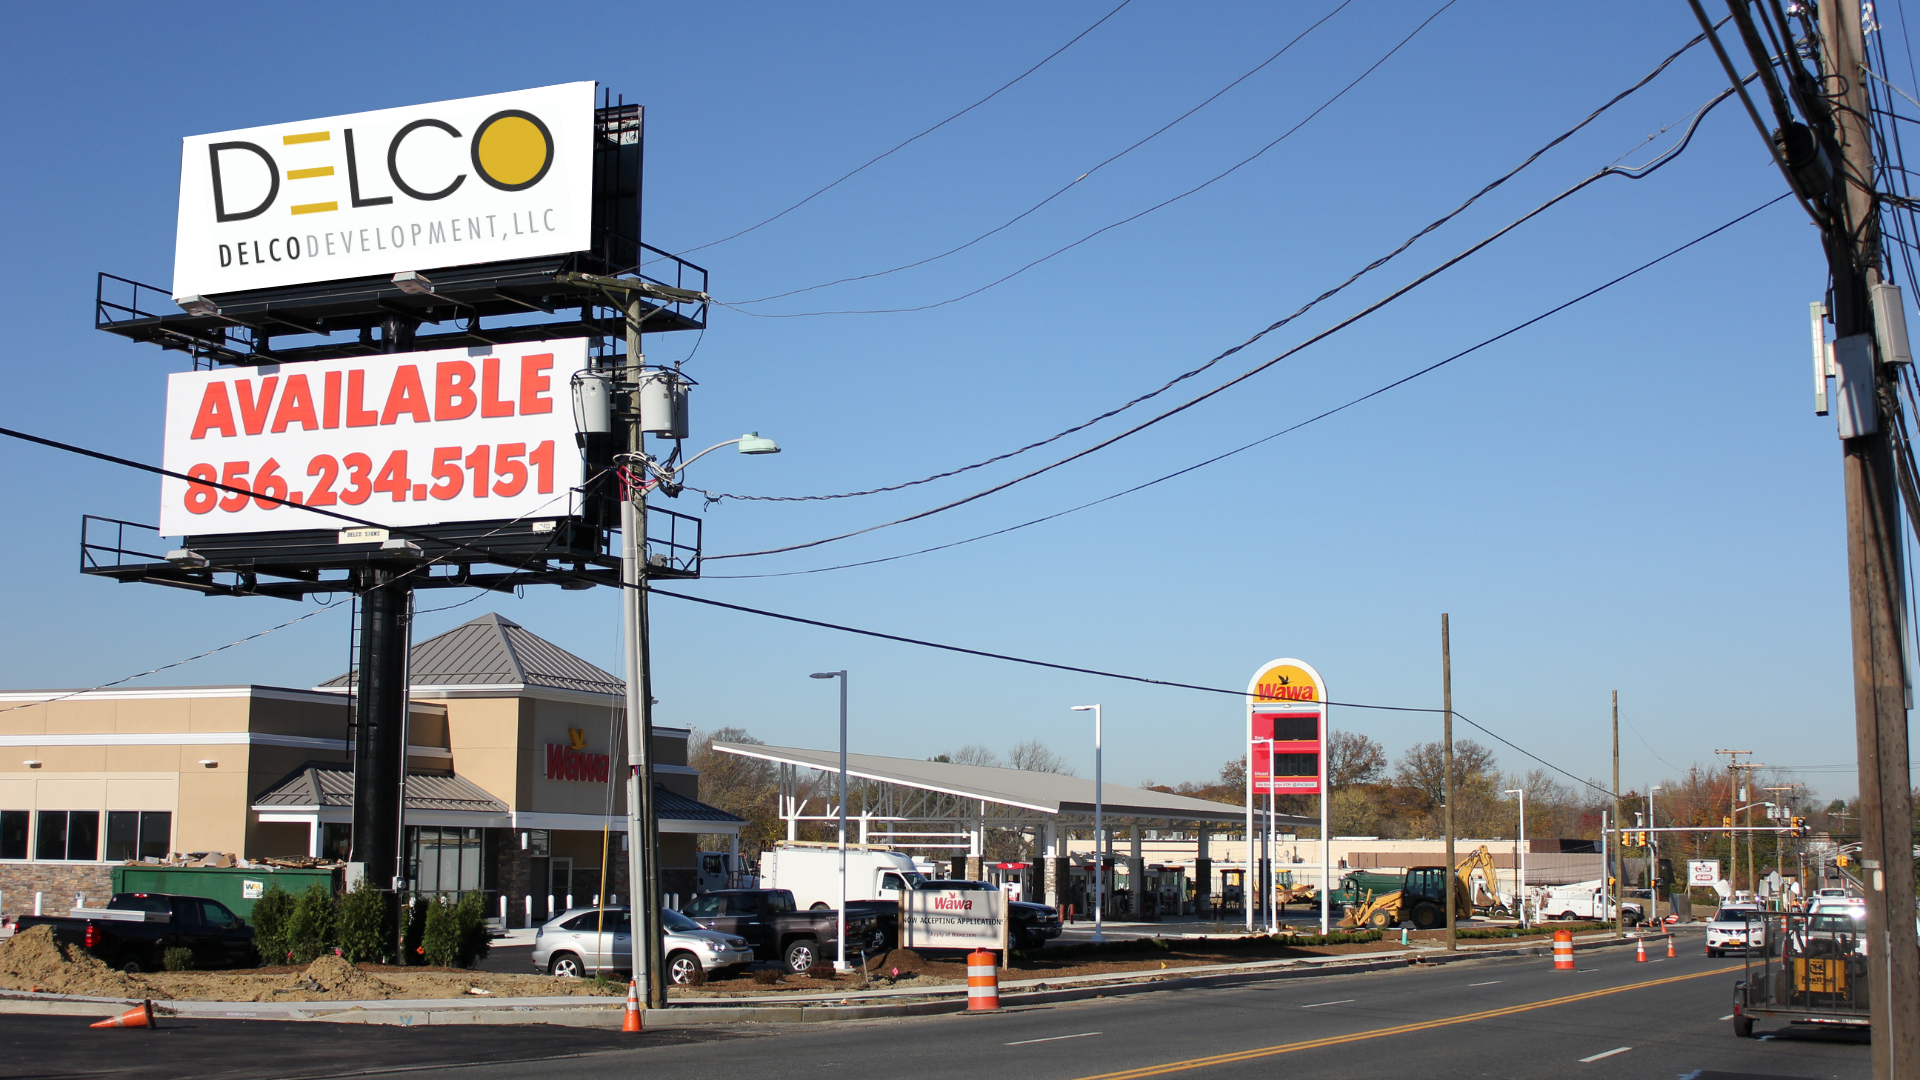 Billboard with Delco logo